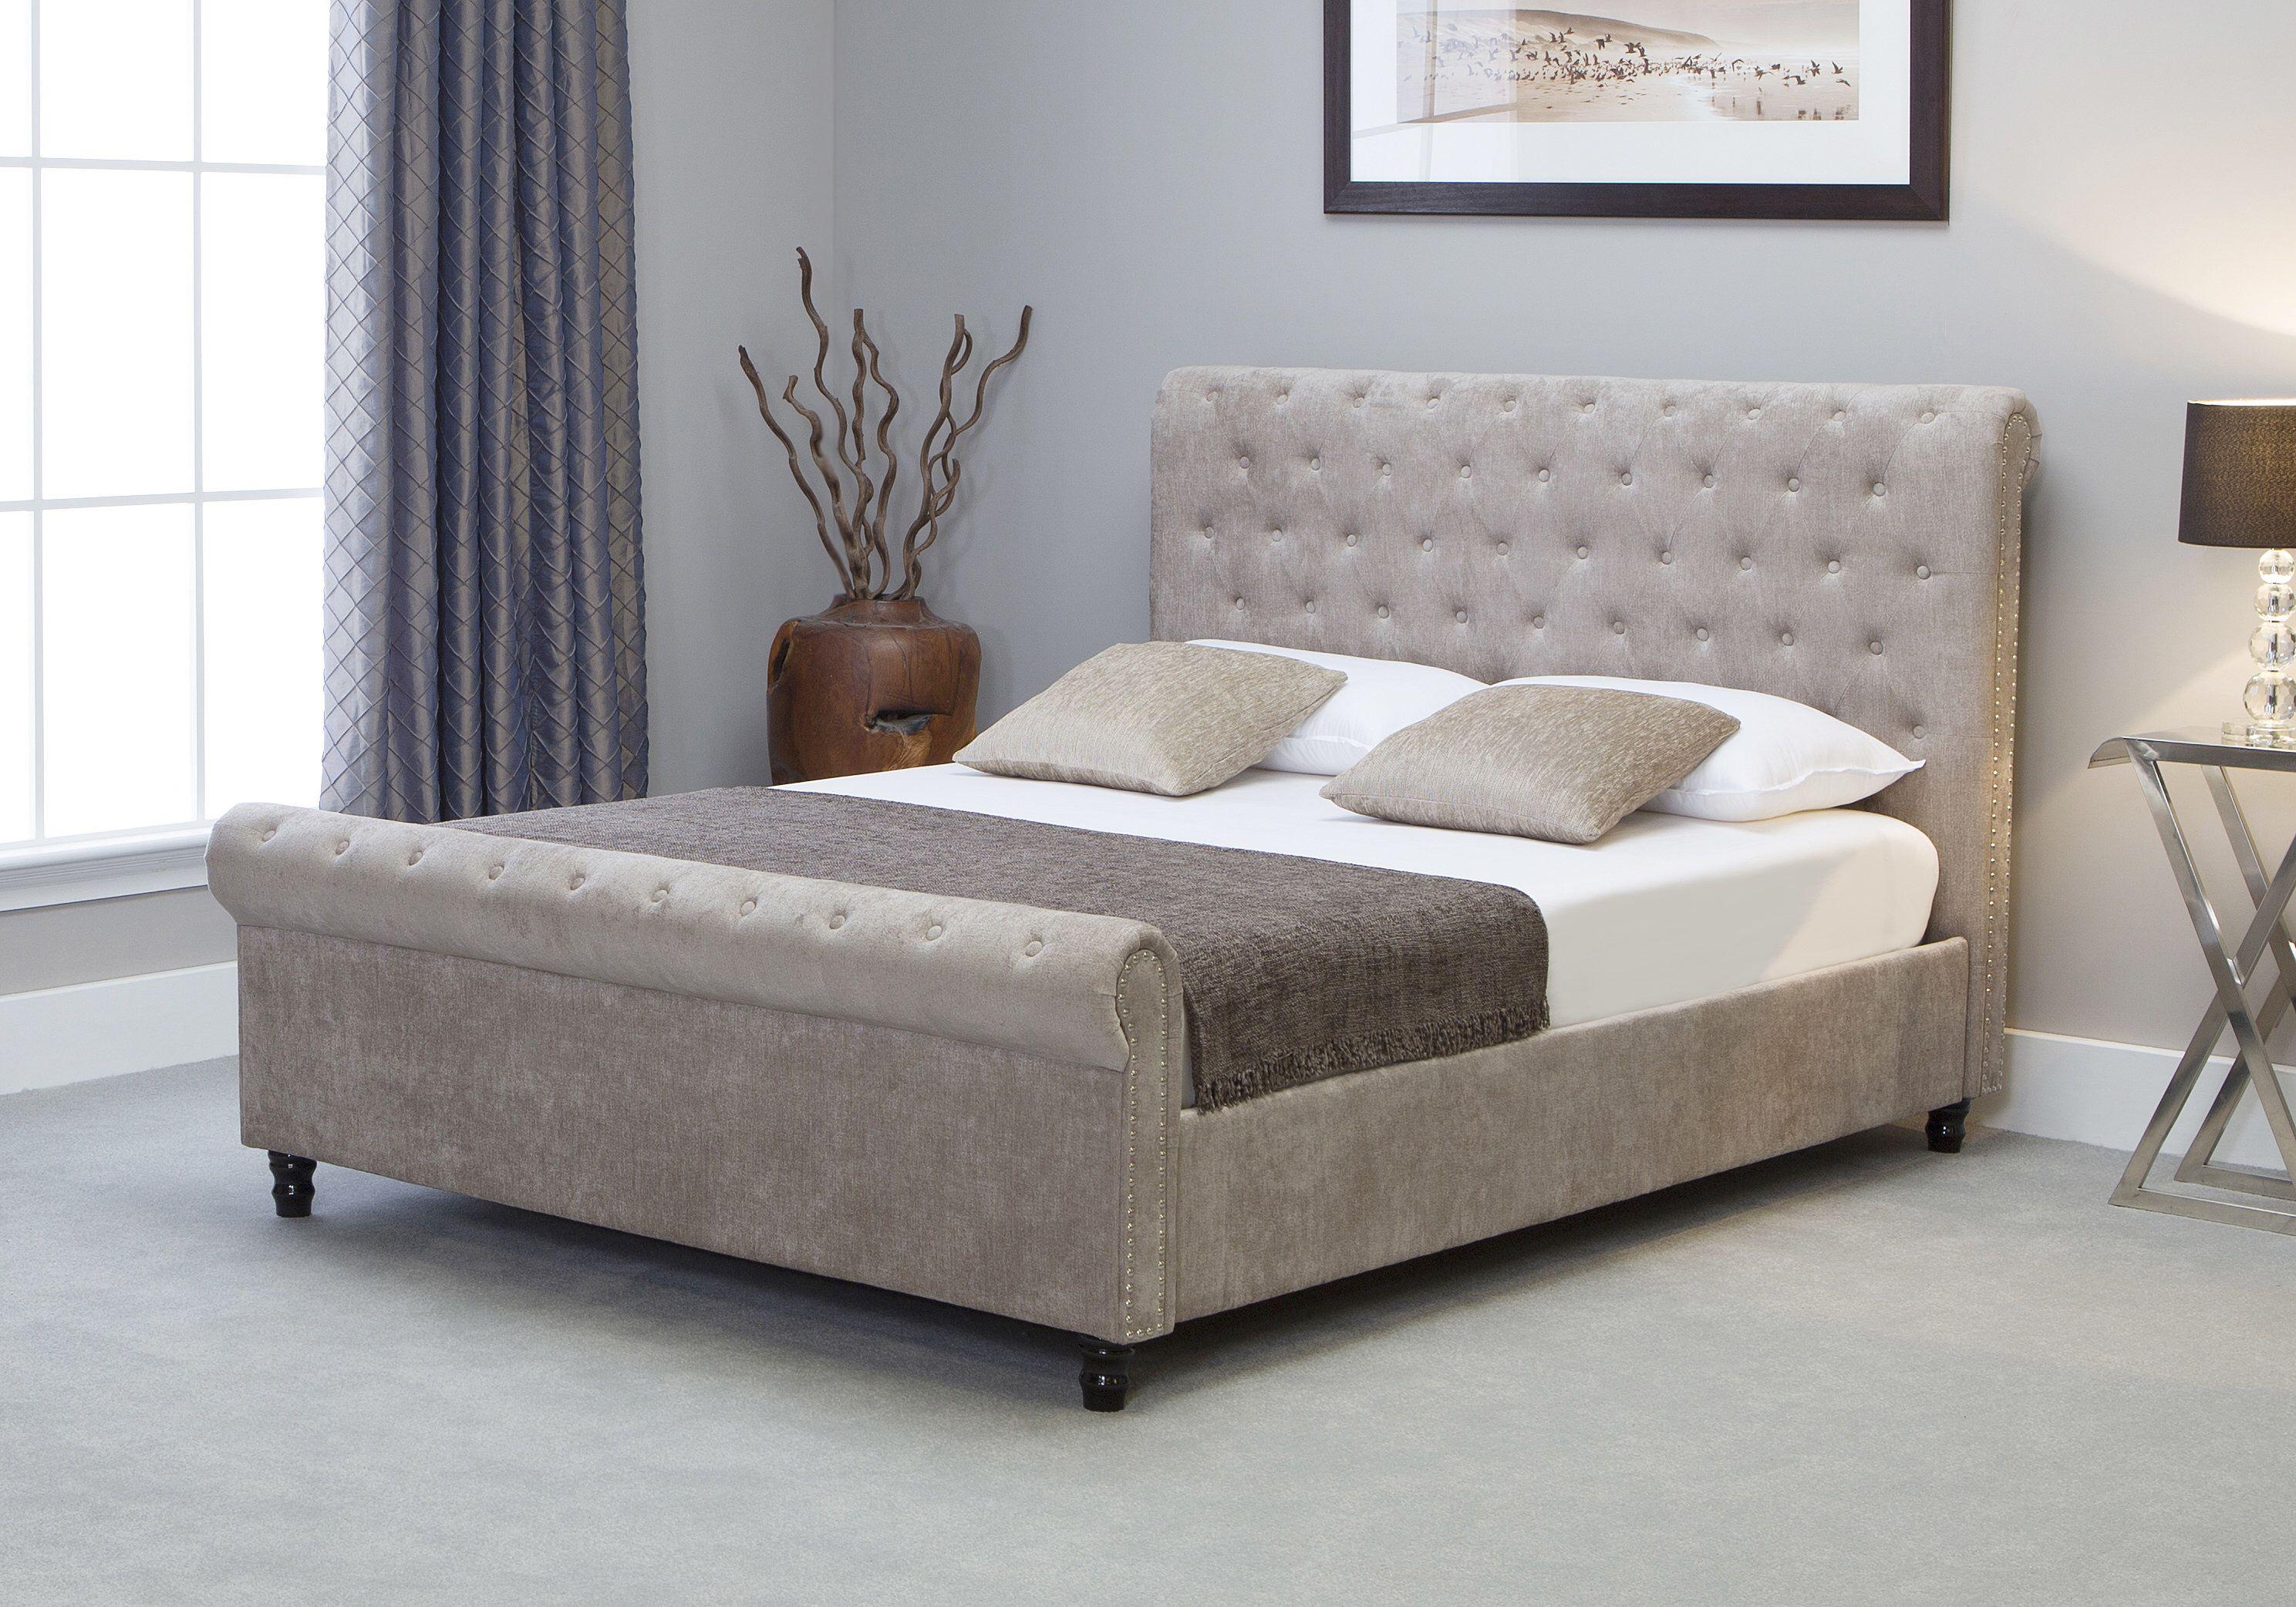 Awe Inspiring Charles Upholstered Ottoman Bed Bedroom Ottoman Bed Customarchery Wood Chair Design Ideas Customarcherynet